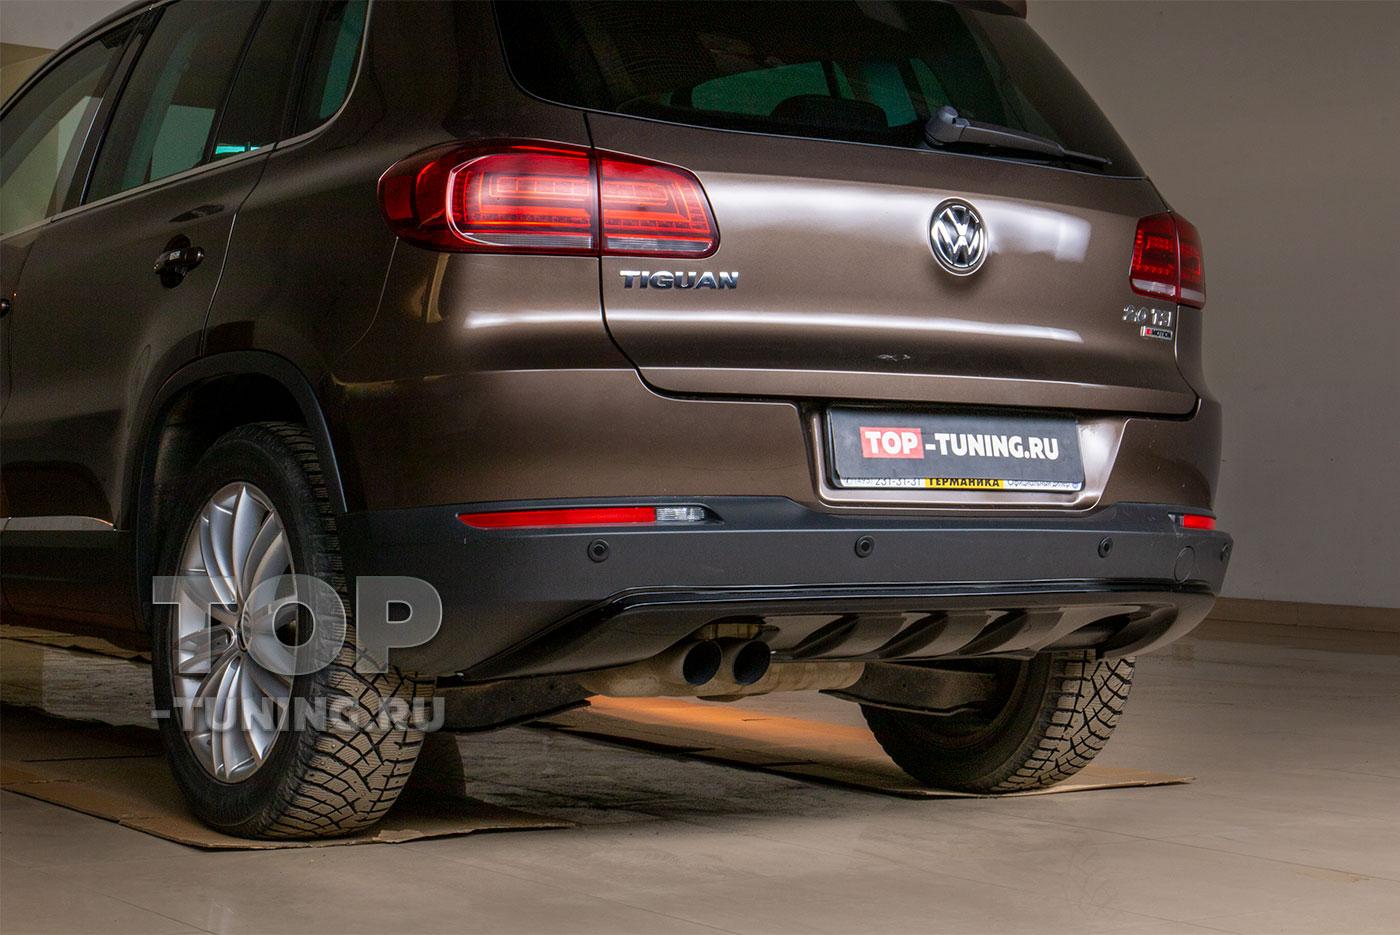 103231 Установка диффузора под раздвоенный выхлоп для VW Tiguan 1